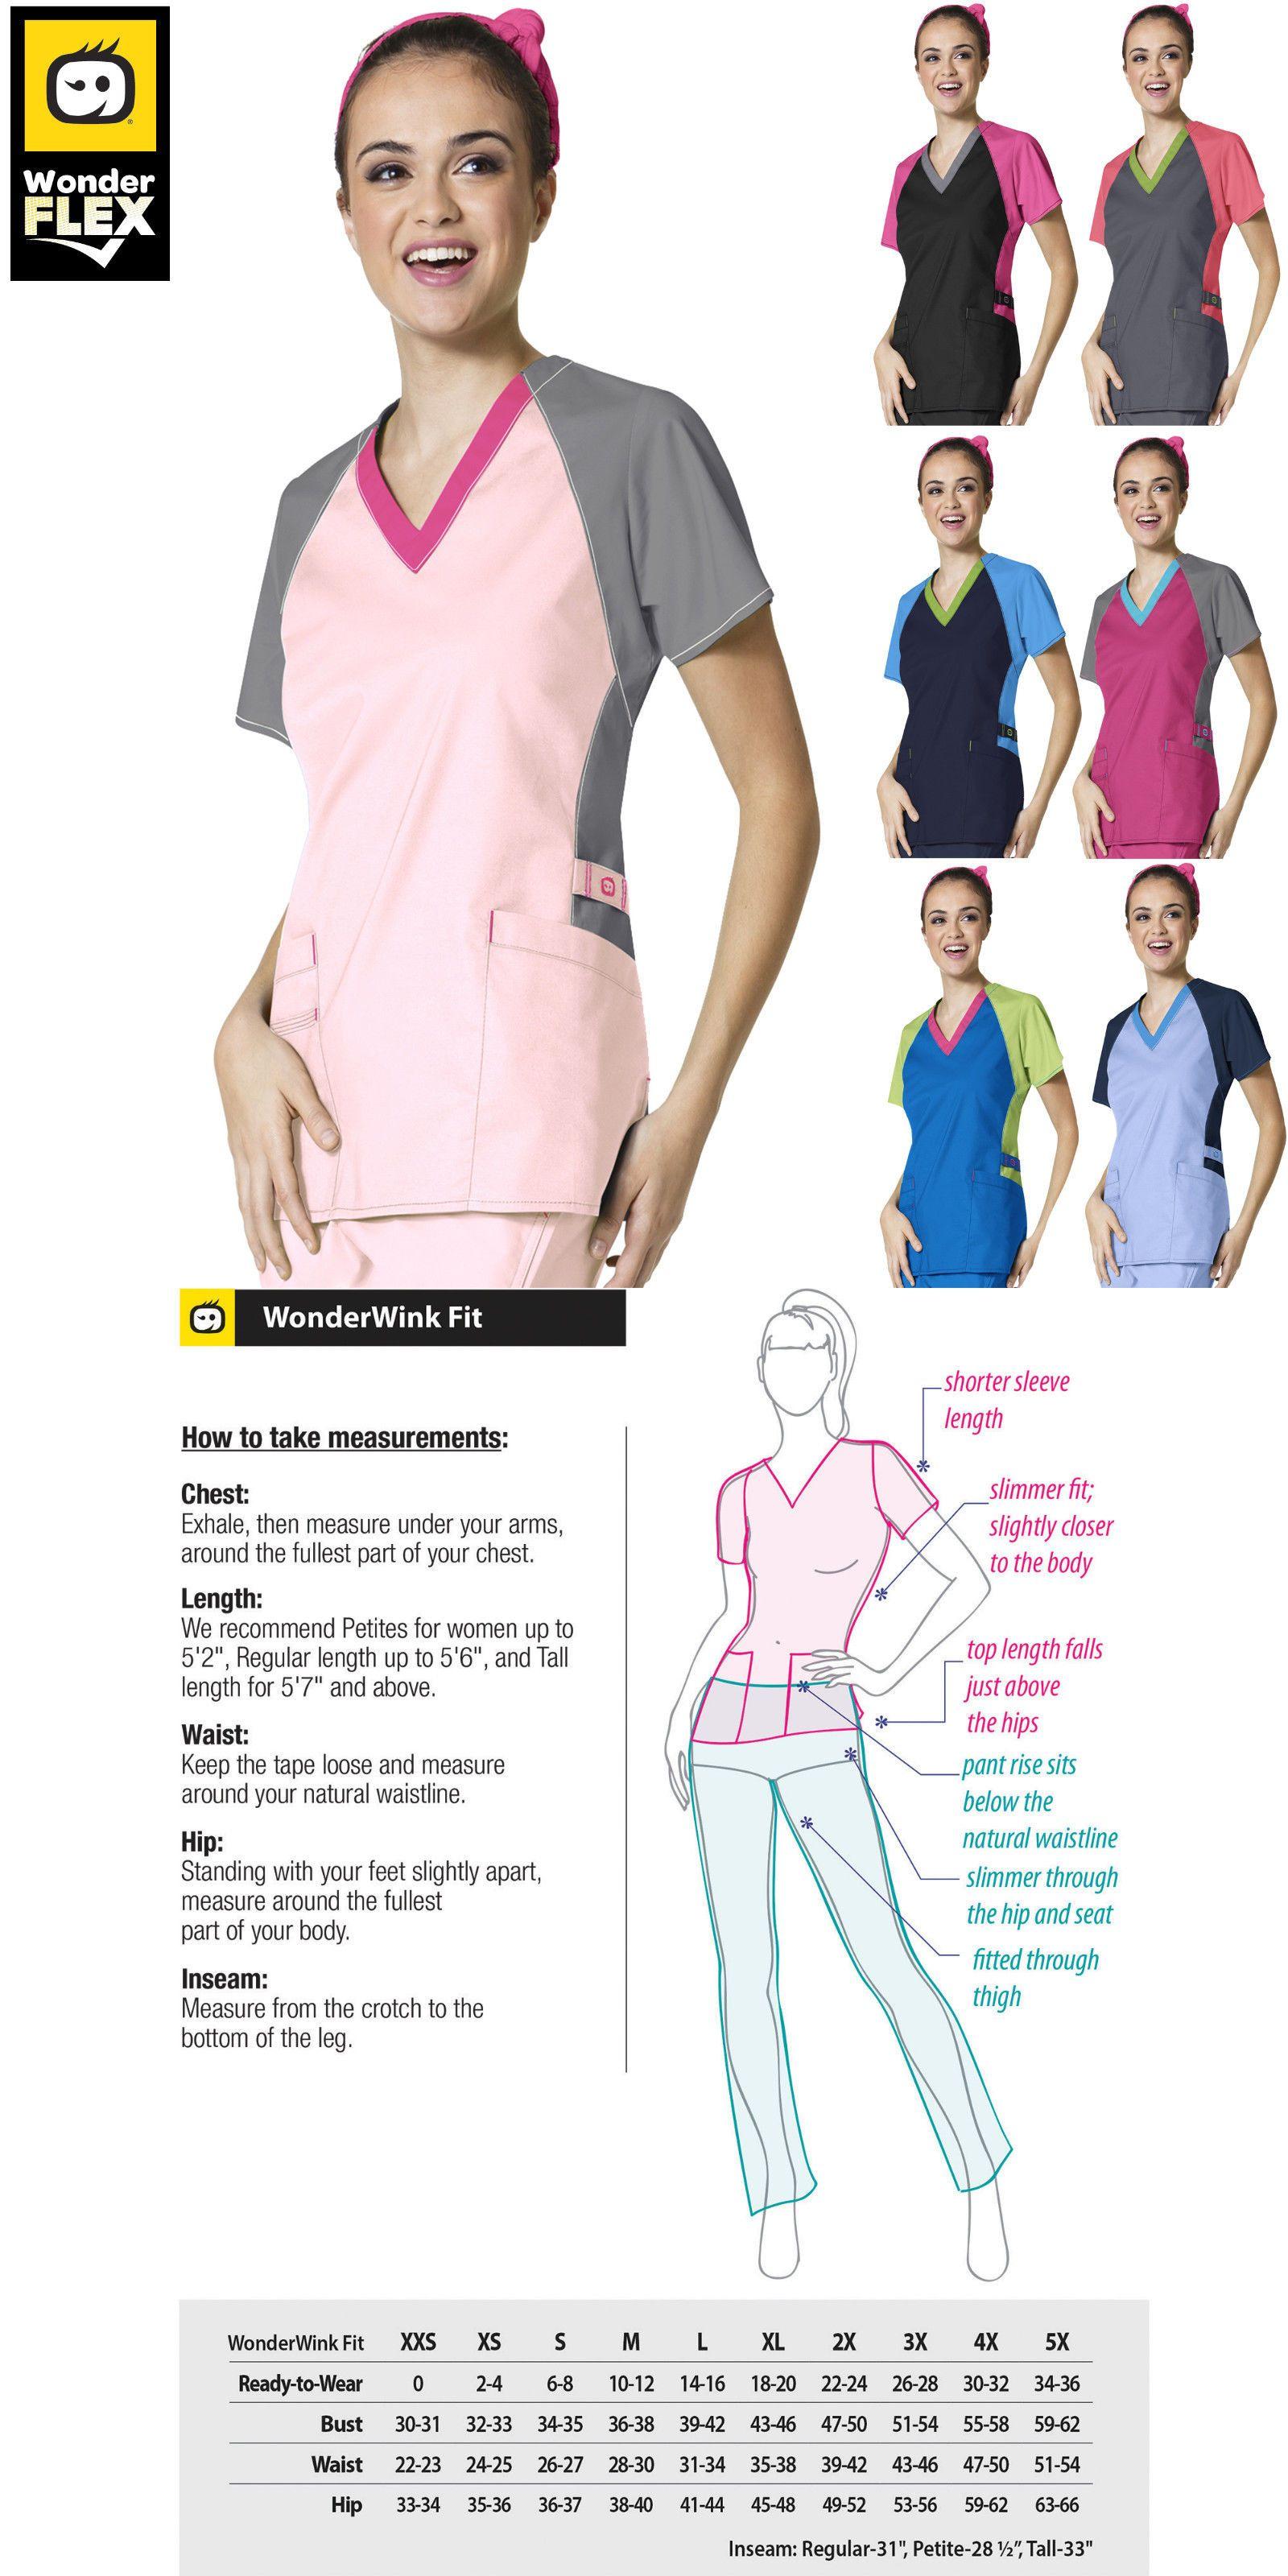 bb3d72e03e2 Sets 105432: Wonderwink Flex [Xxs-3Xl] Women S Medical V-Neck Trinity Color  Block Scrub Top -> BUY IT NOW ONLY: $19.78 on #eBay #wonderwink #women # medical ...